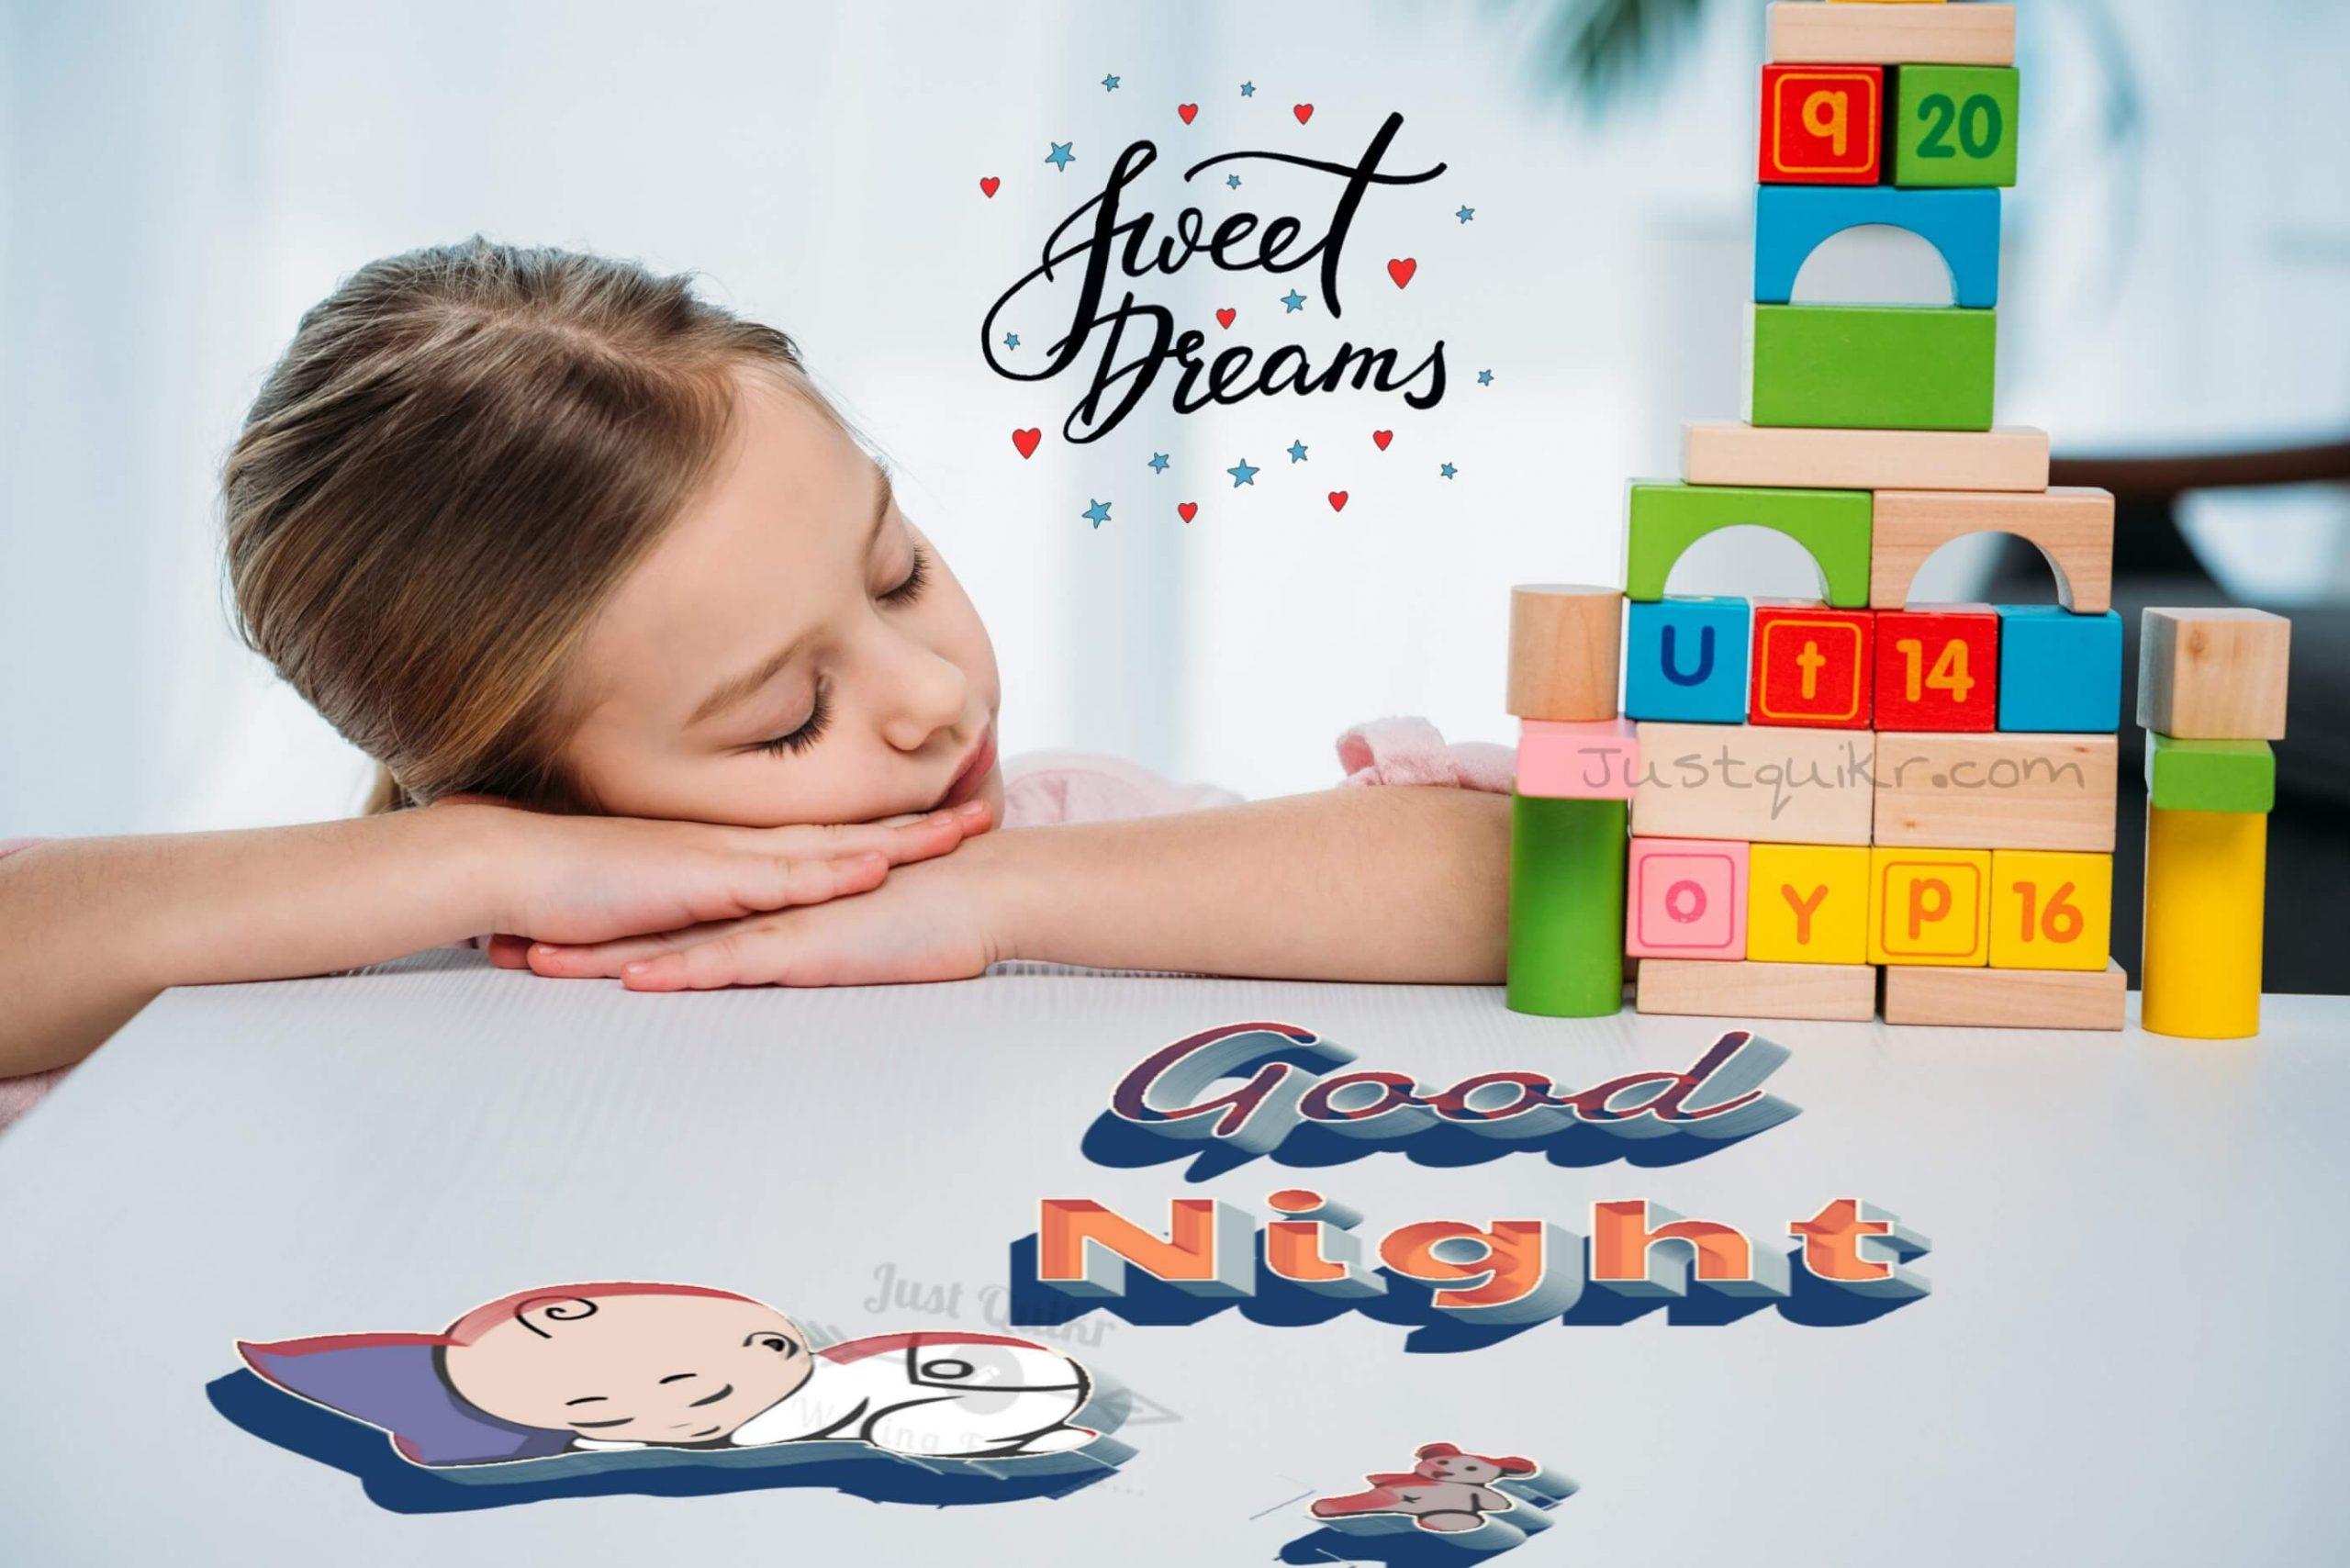 Good Night HD Pics Images For Elder Sister